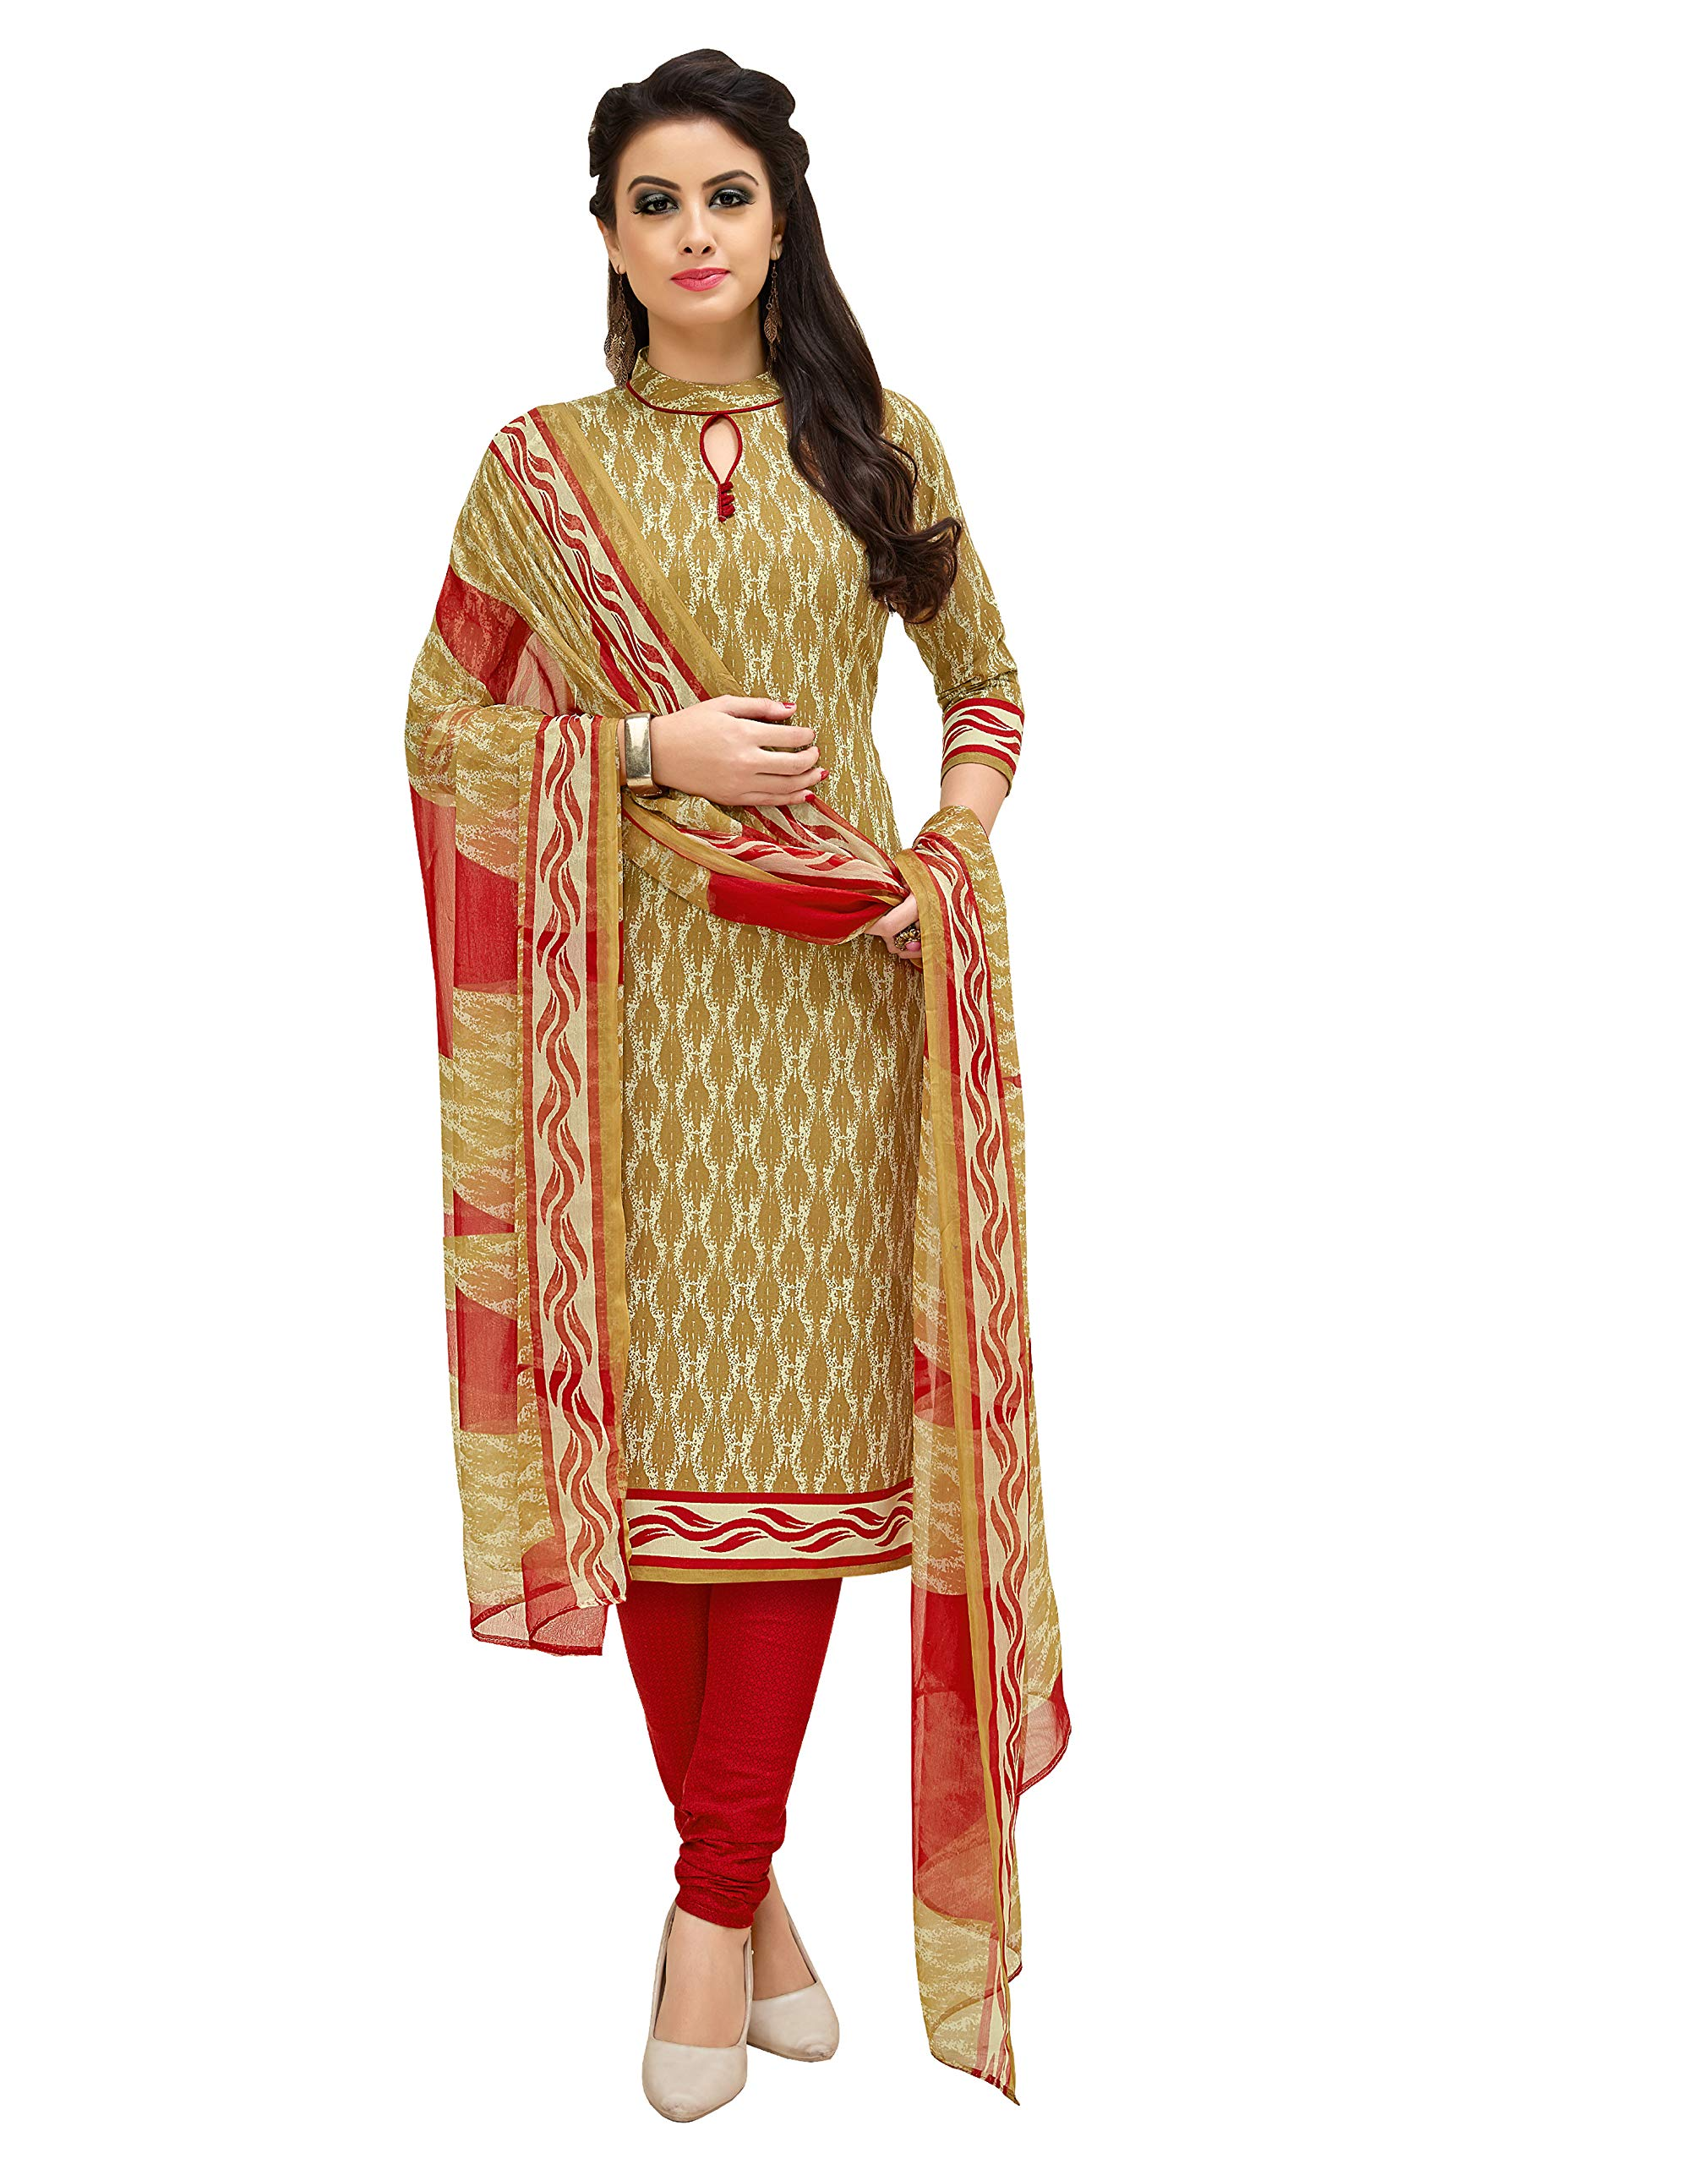 f0957f9ca5 Viva N Diva Salwar Suit Dupatta For Women's Beige Cotton Printed Un ...